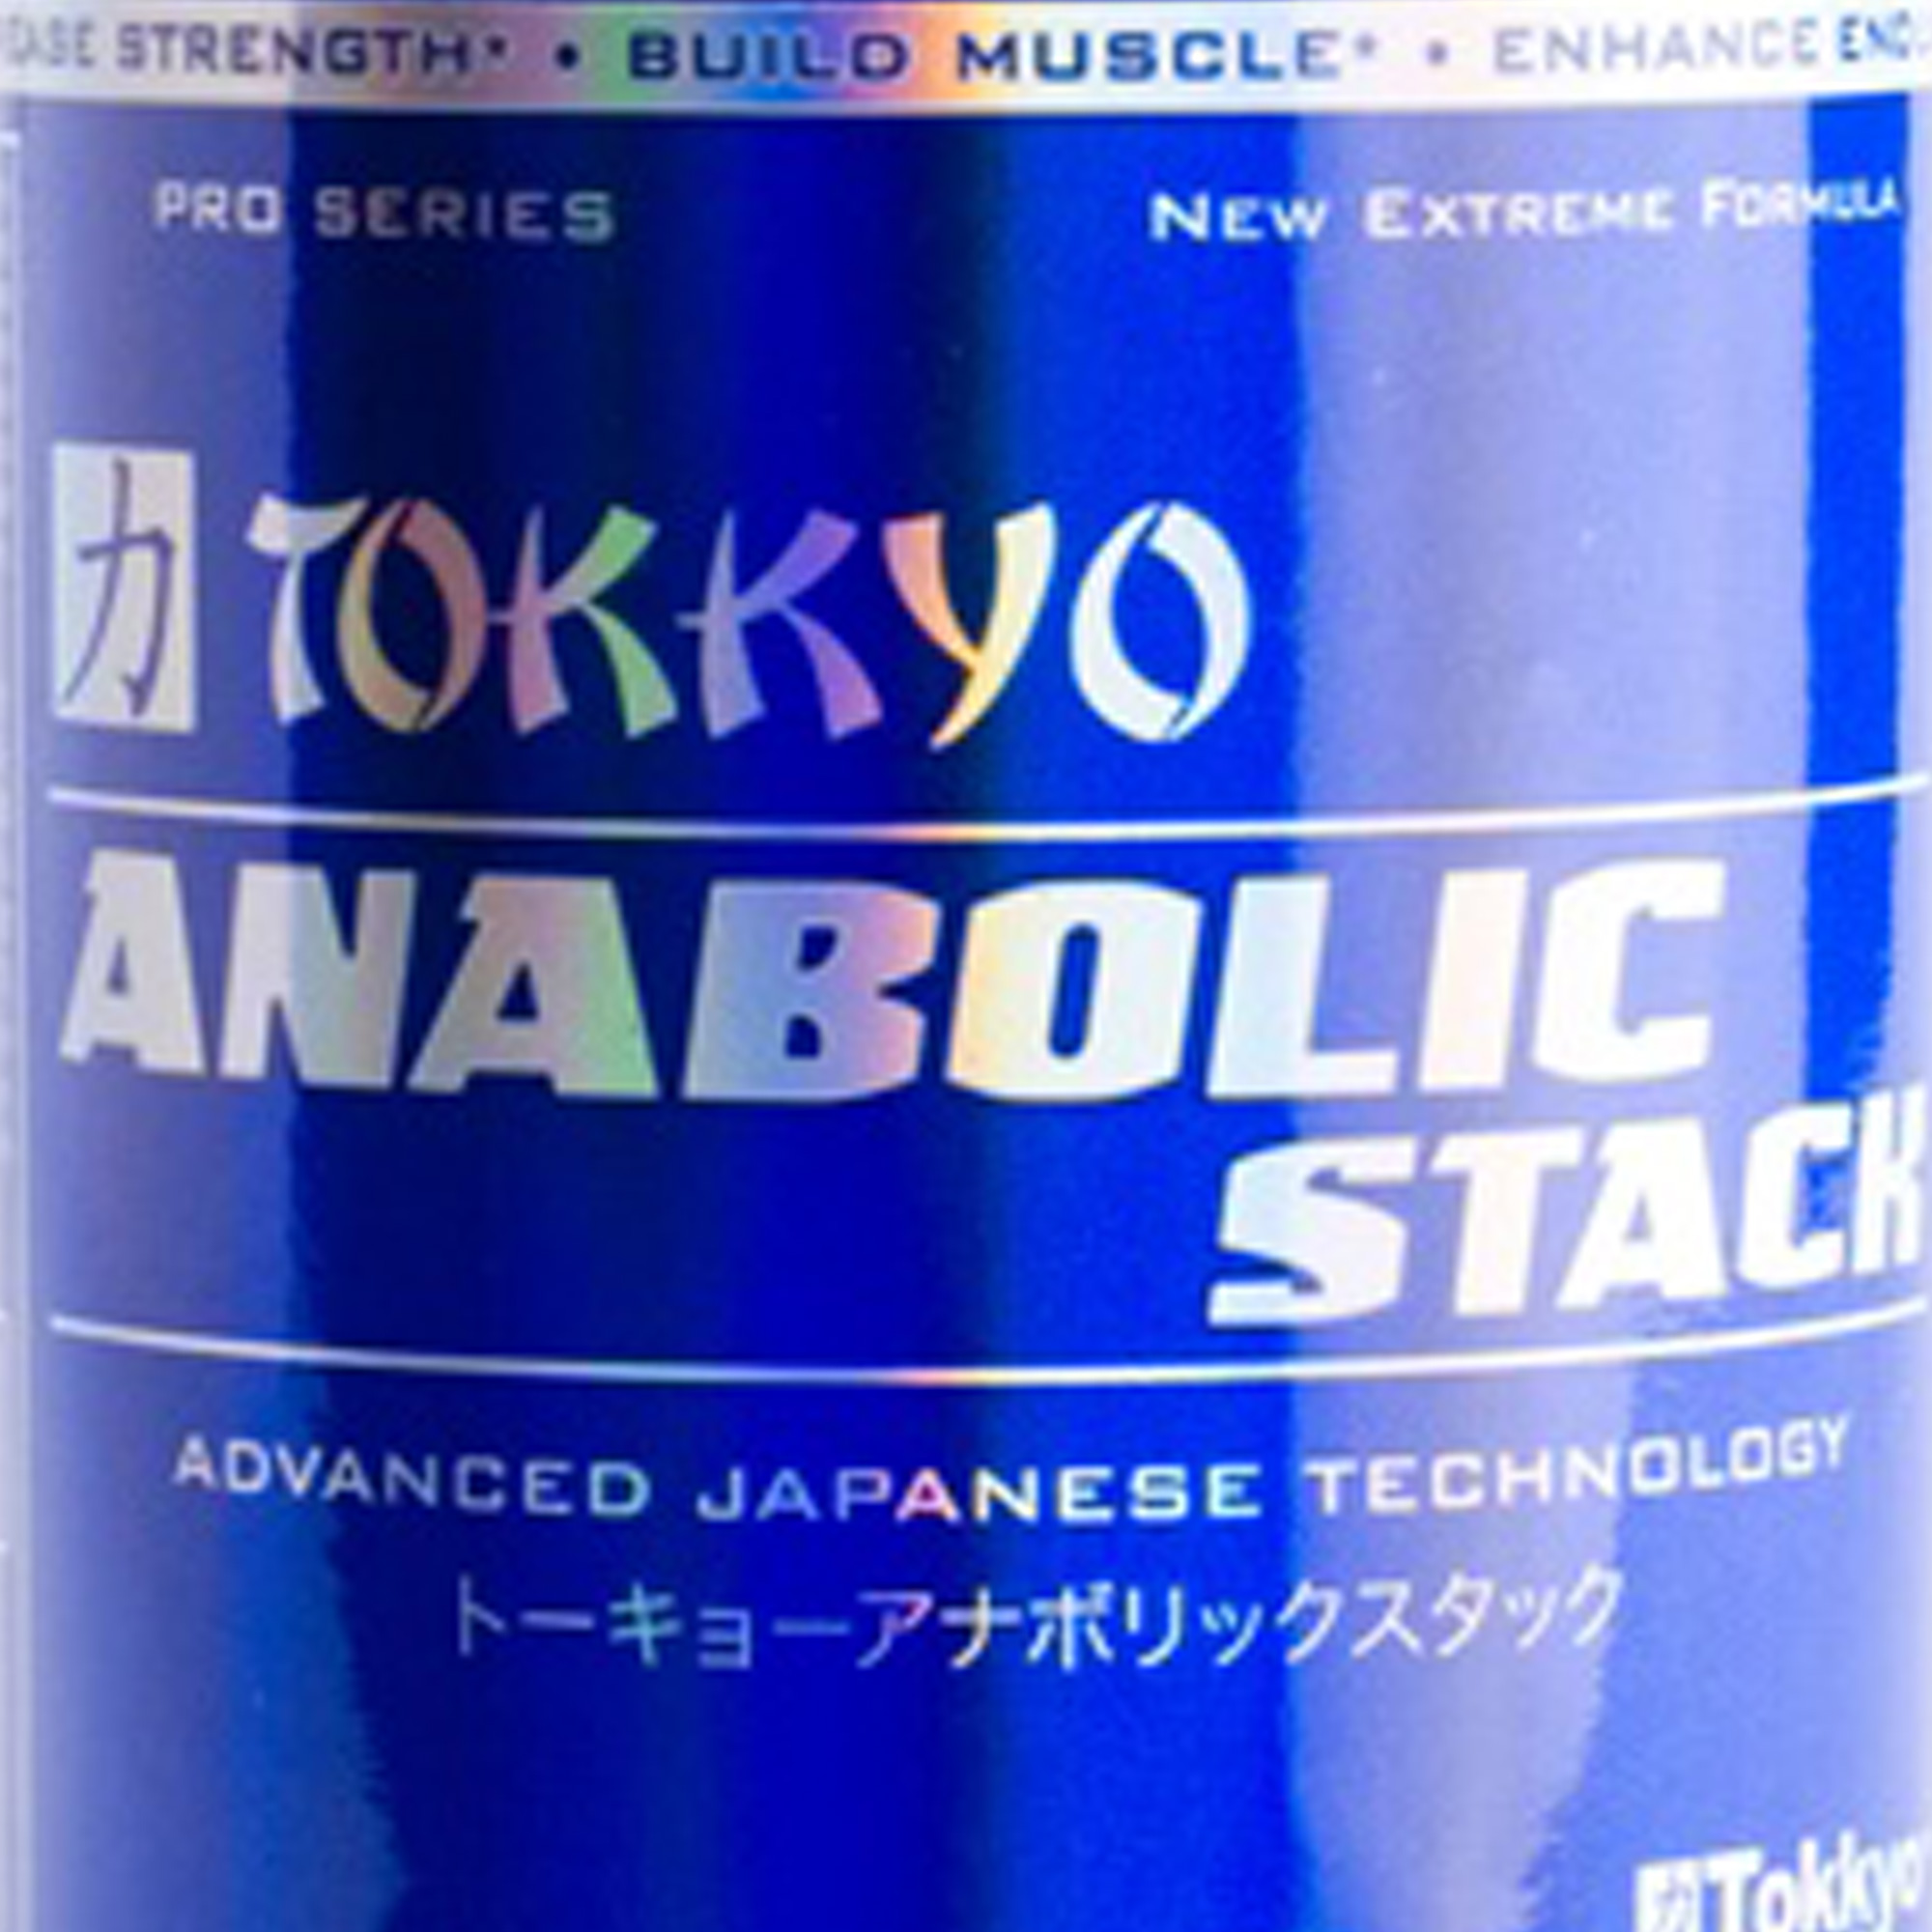 tokkyo anabolic stack